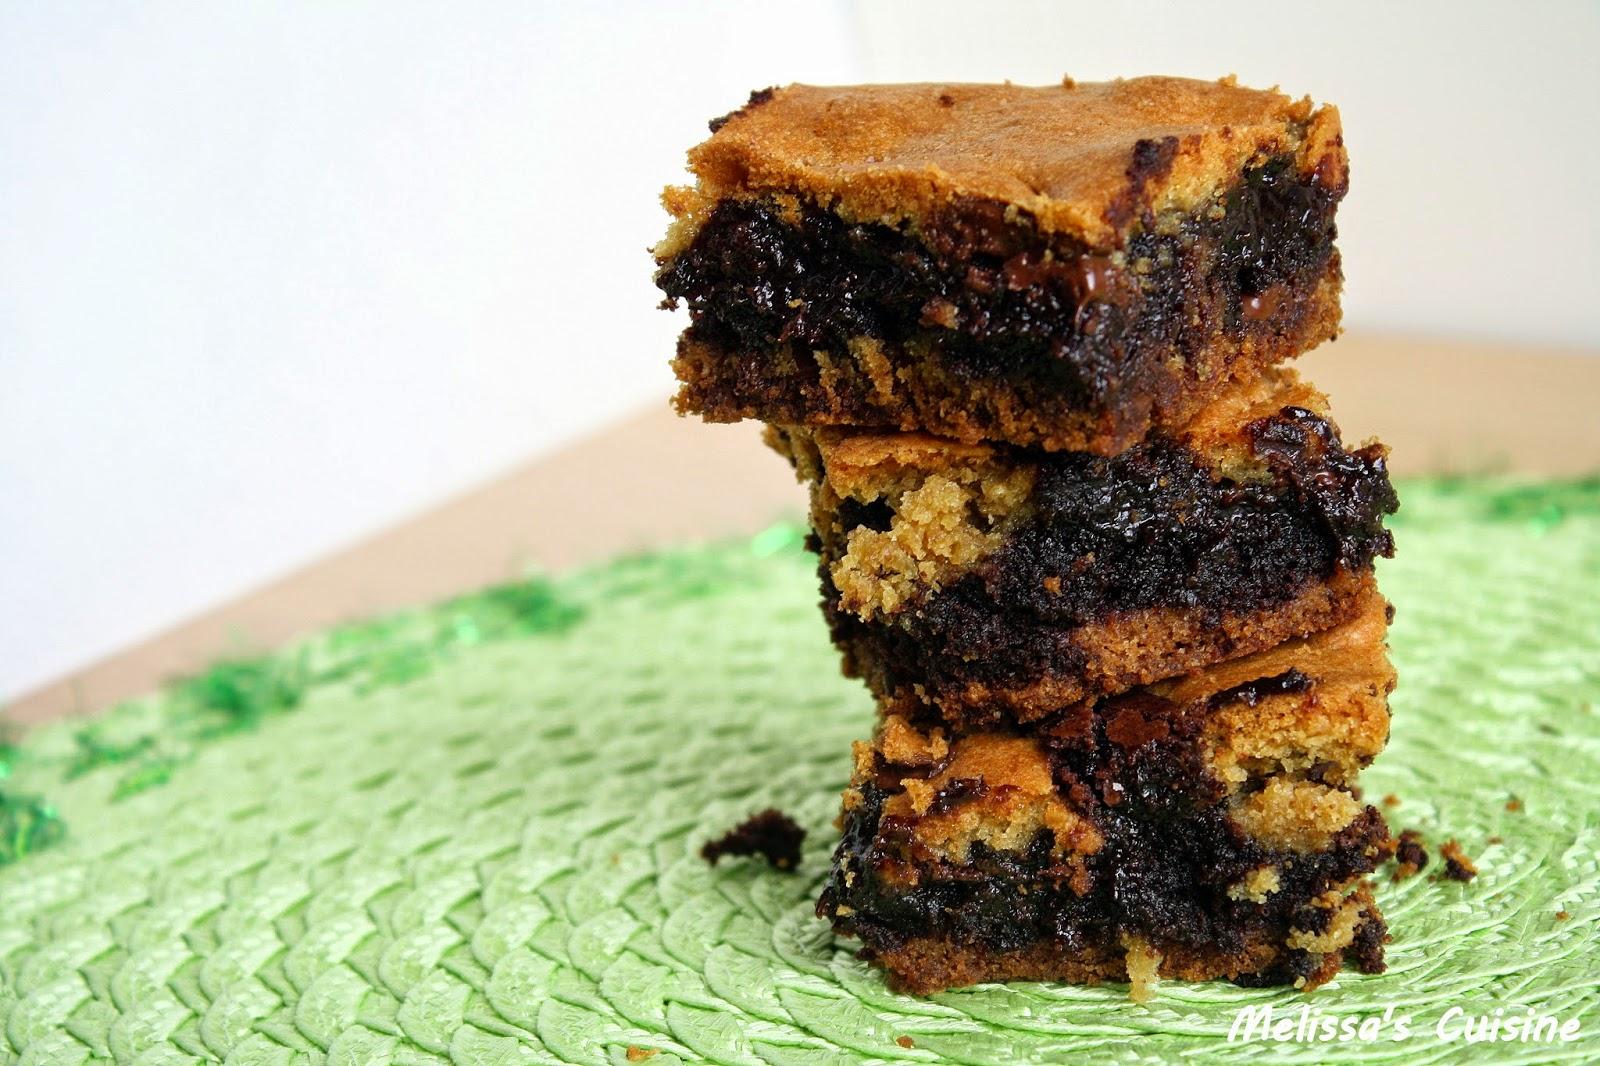 Melissa's Cuisine:  Chocolate Chip Cookie Brownie Bars